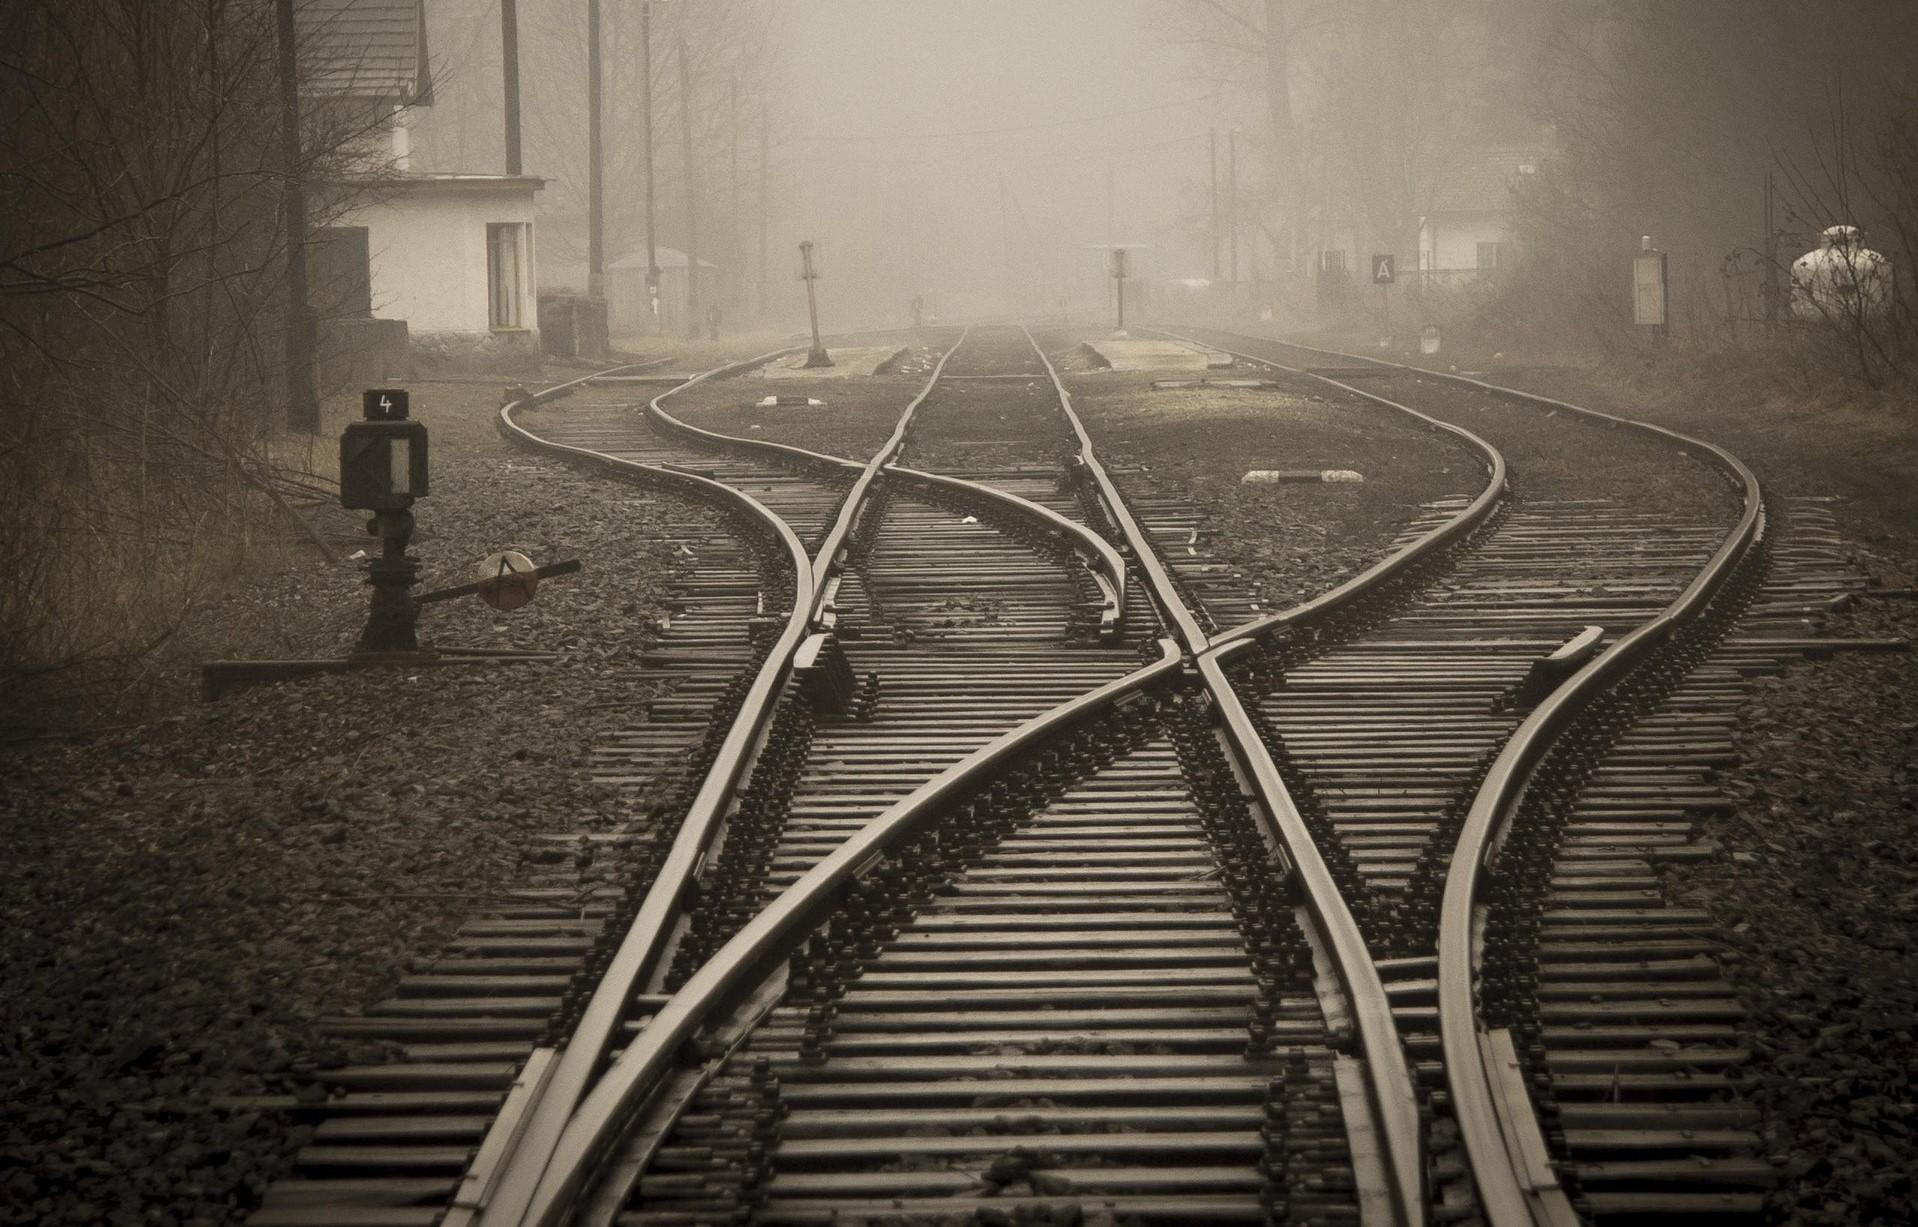 a dense railway network